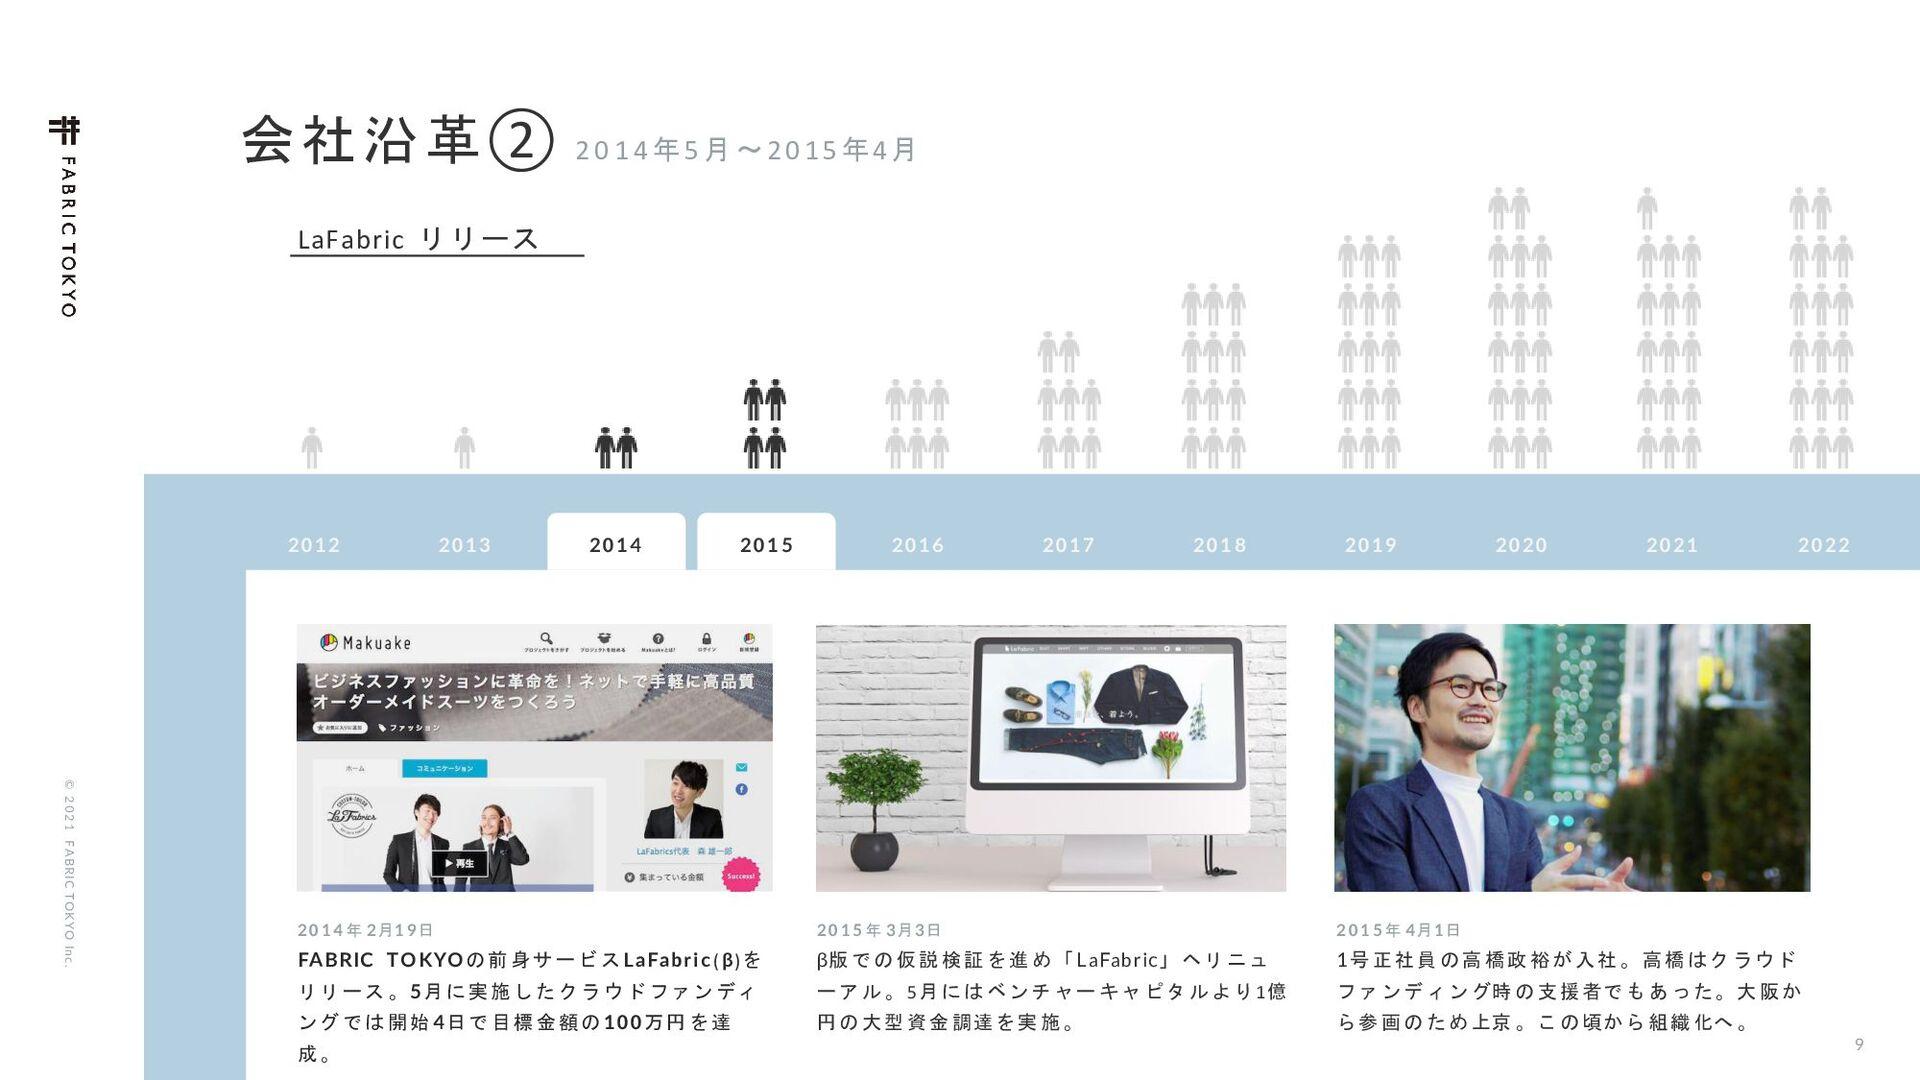 9 © 2021 FABRIC TOKYO Inc. ձࣾԊֵᶆ ݄ʙ...